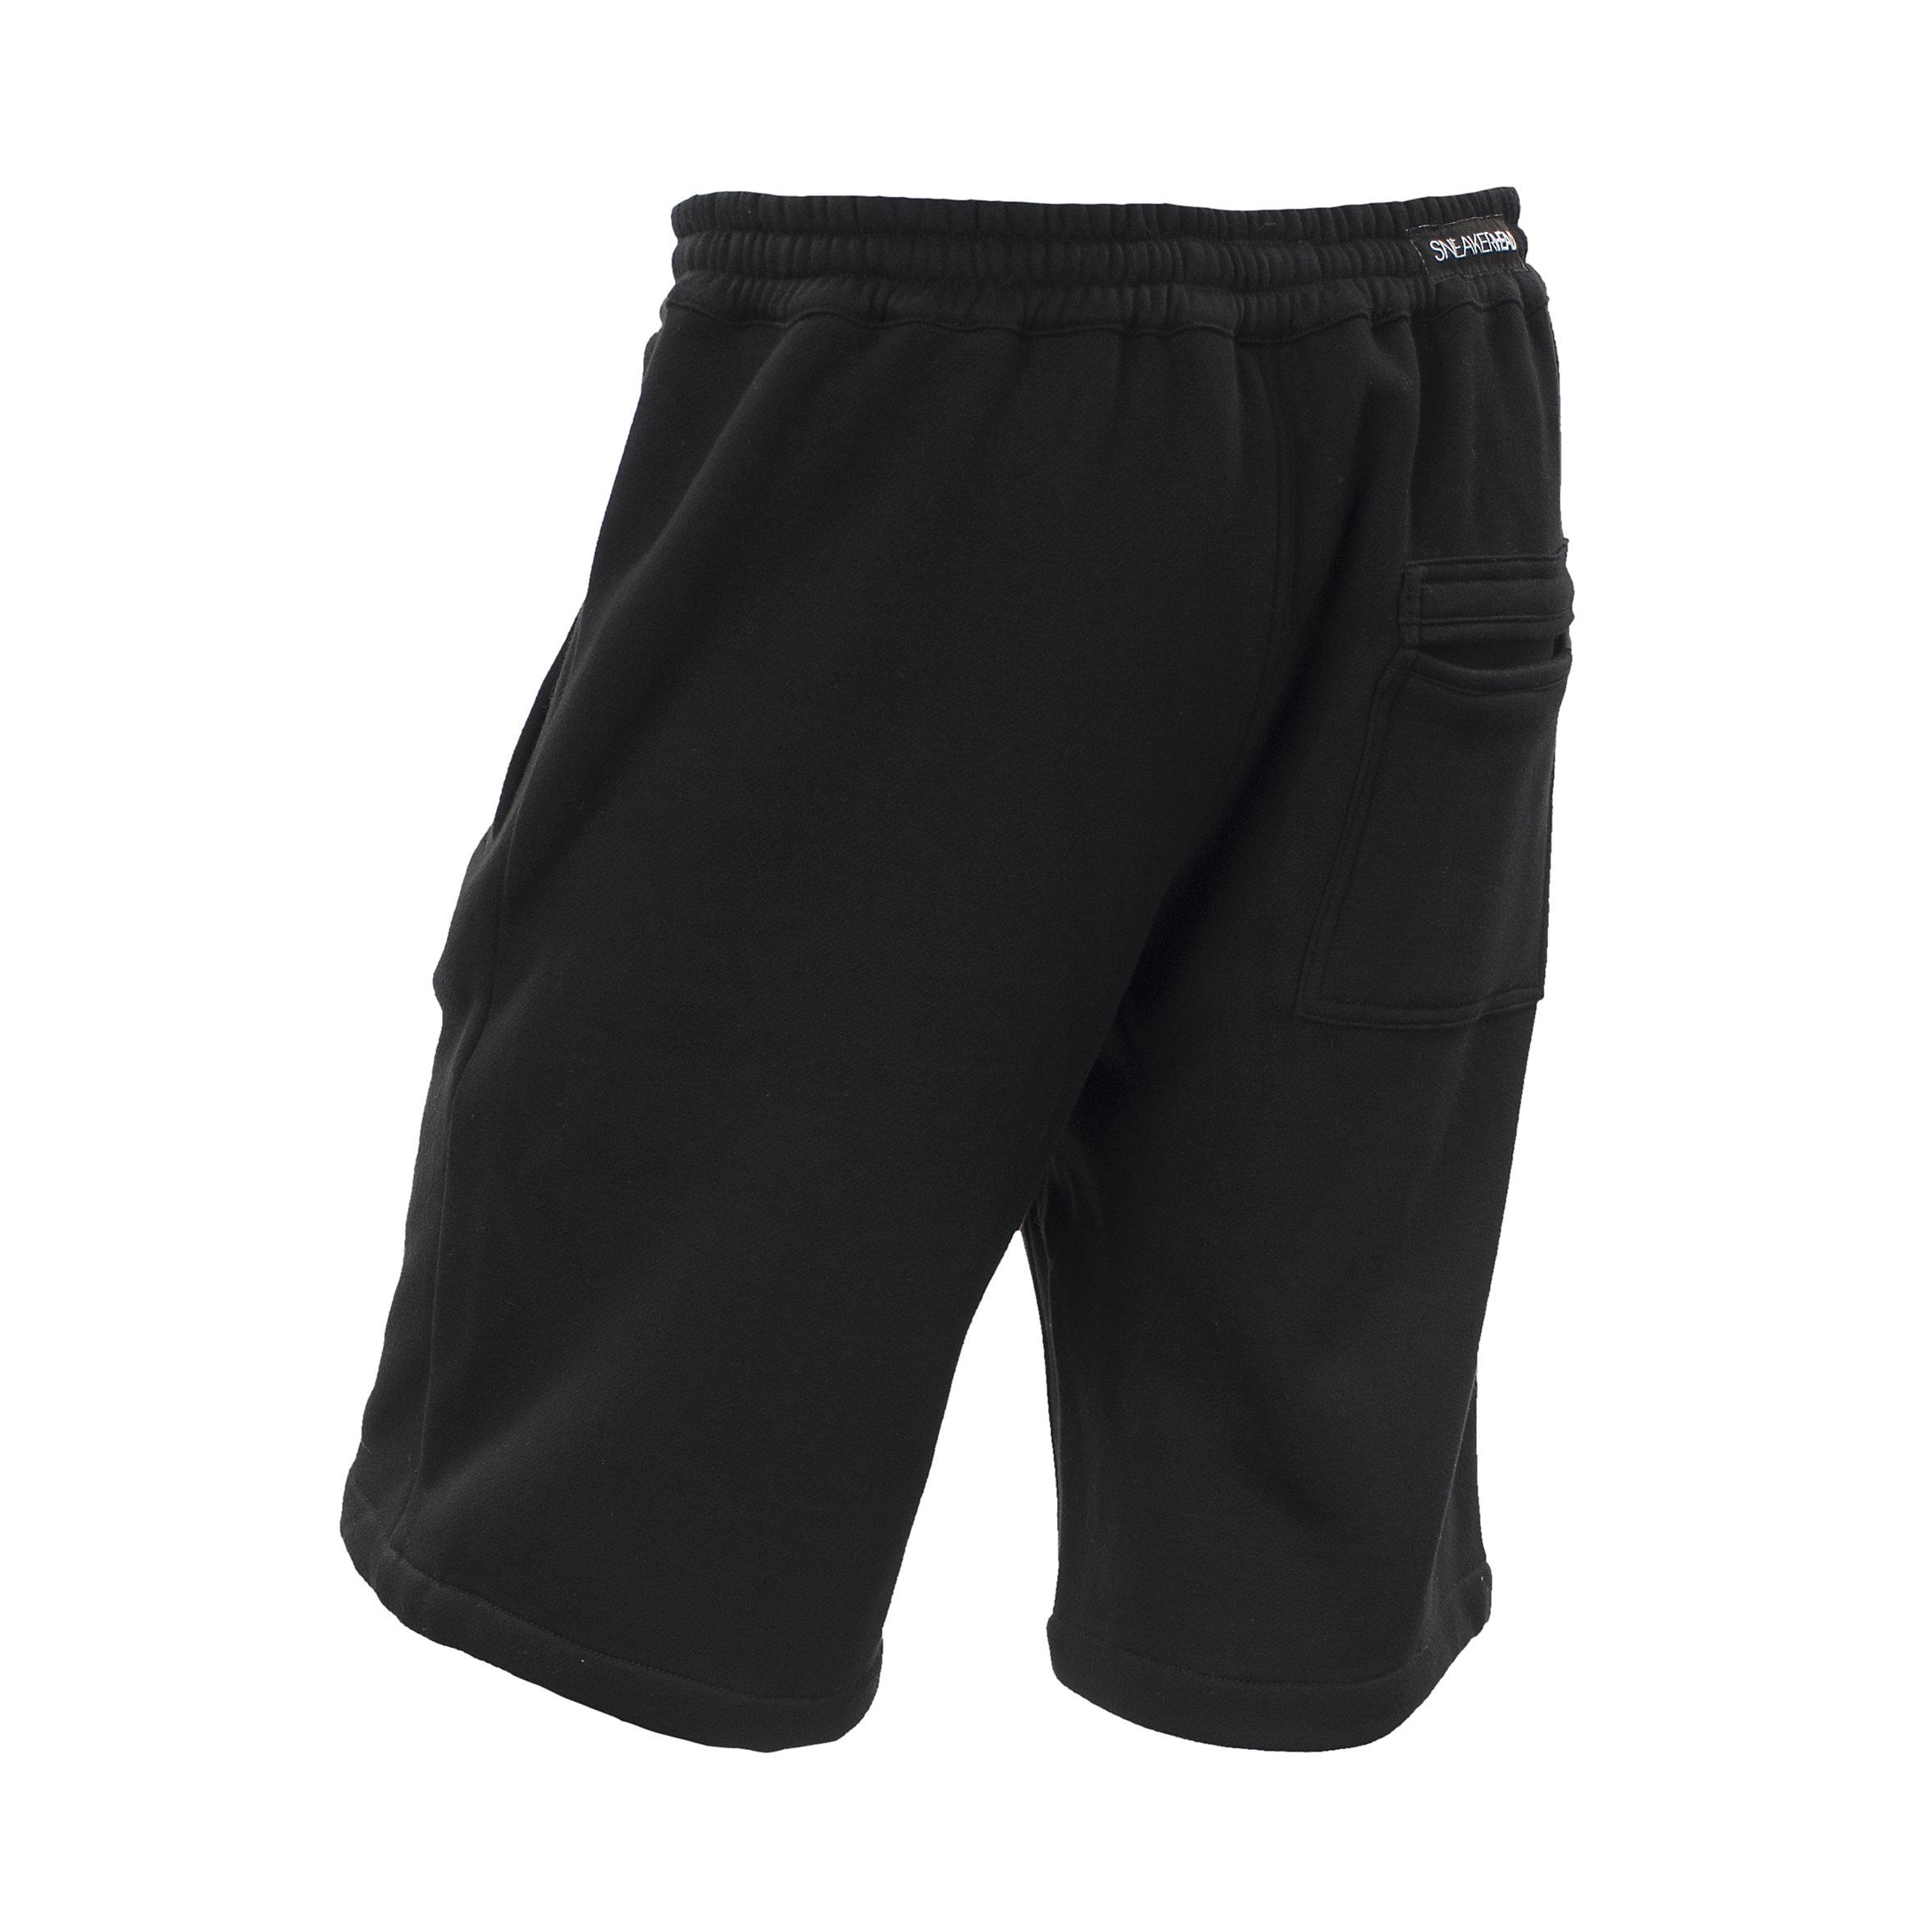 SNEAKERHEAD Stacked Bones Short - $39.99 | Sneakerhead.com ...